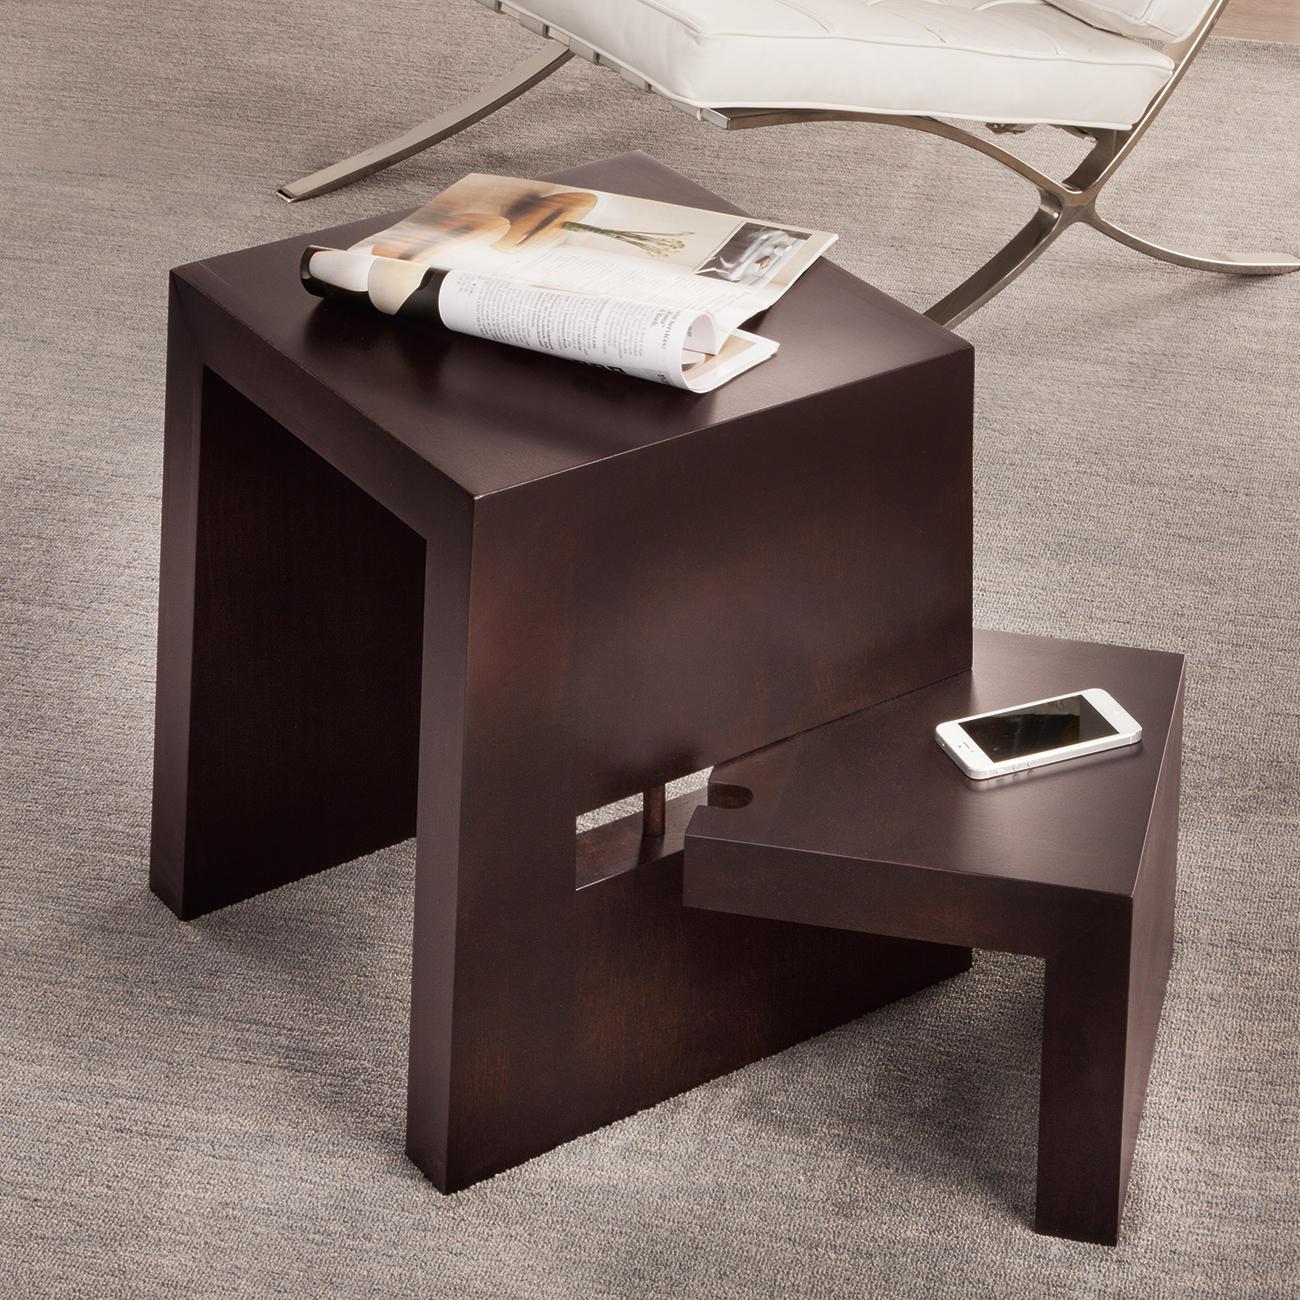 Designer Stool with swivel step - The ingenious stool with a 180° swivel step. & Buy Designer Stool with swivel step online islam-shia.org